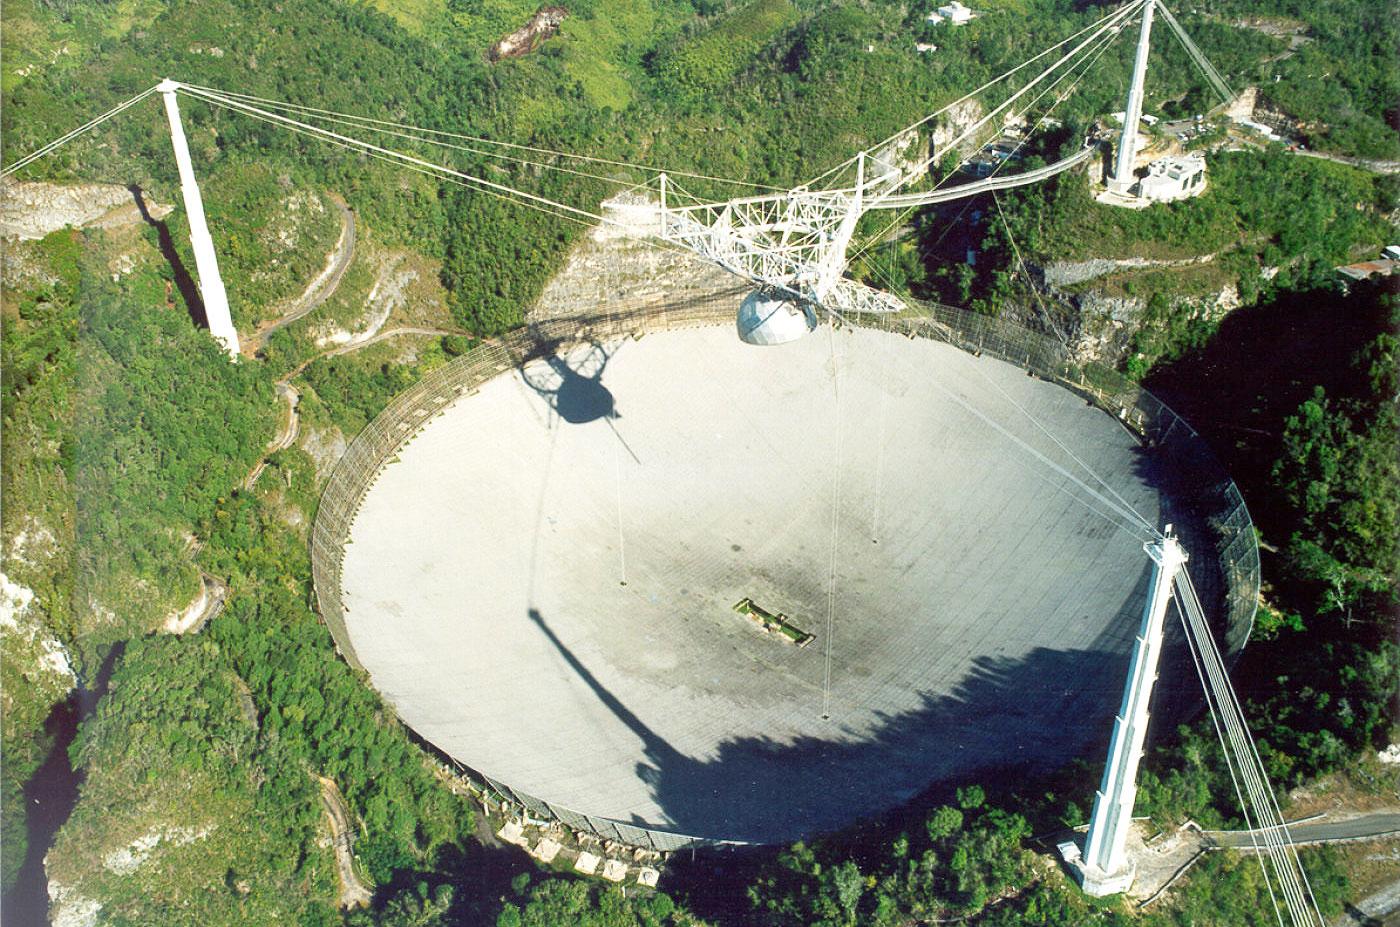 The Arecibo radio telescope is in trouble again